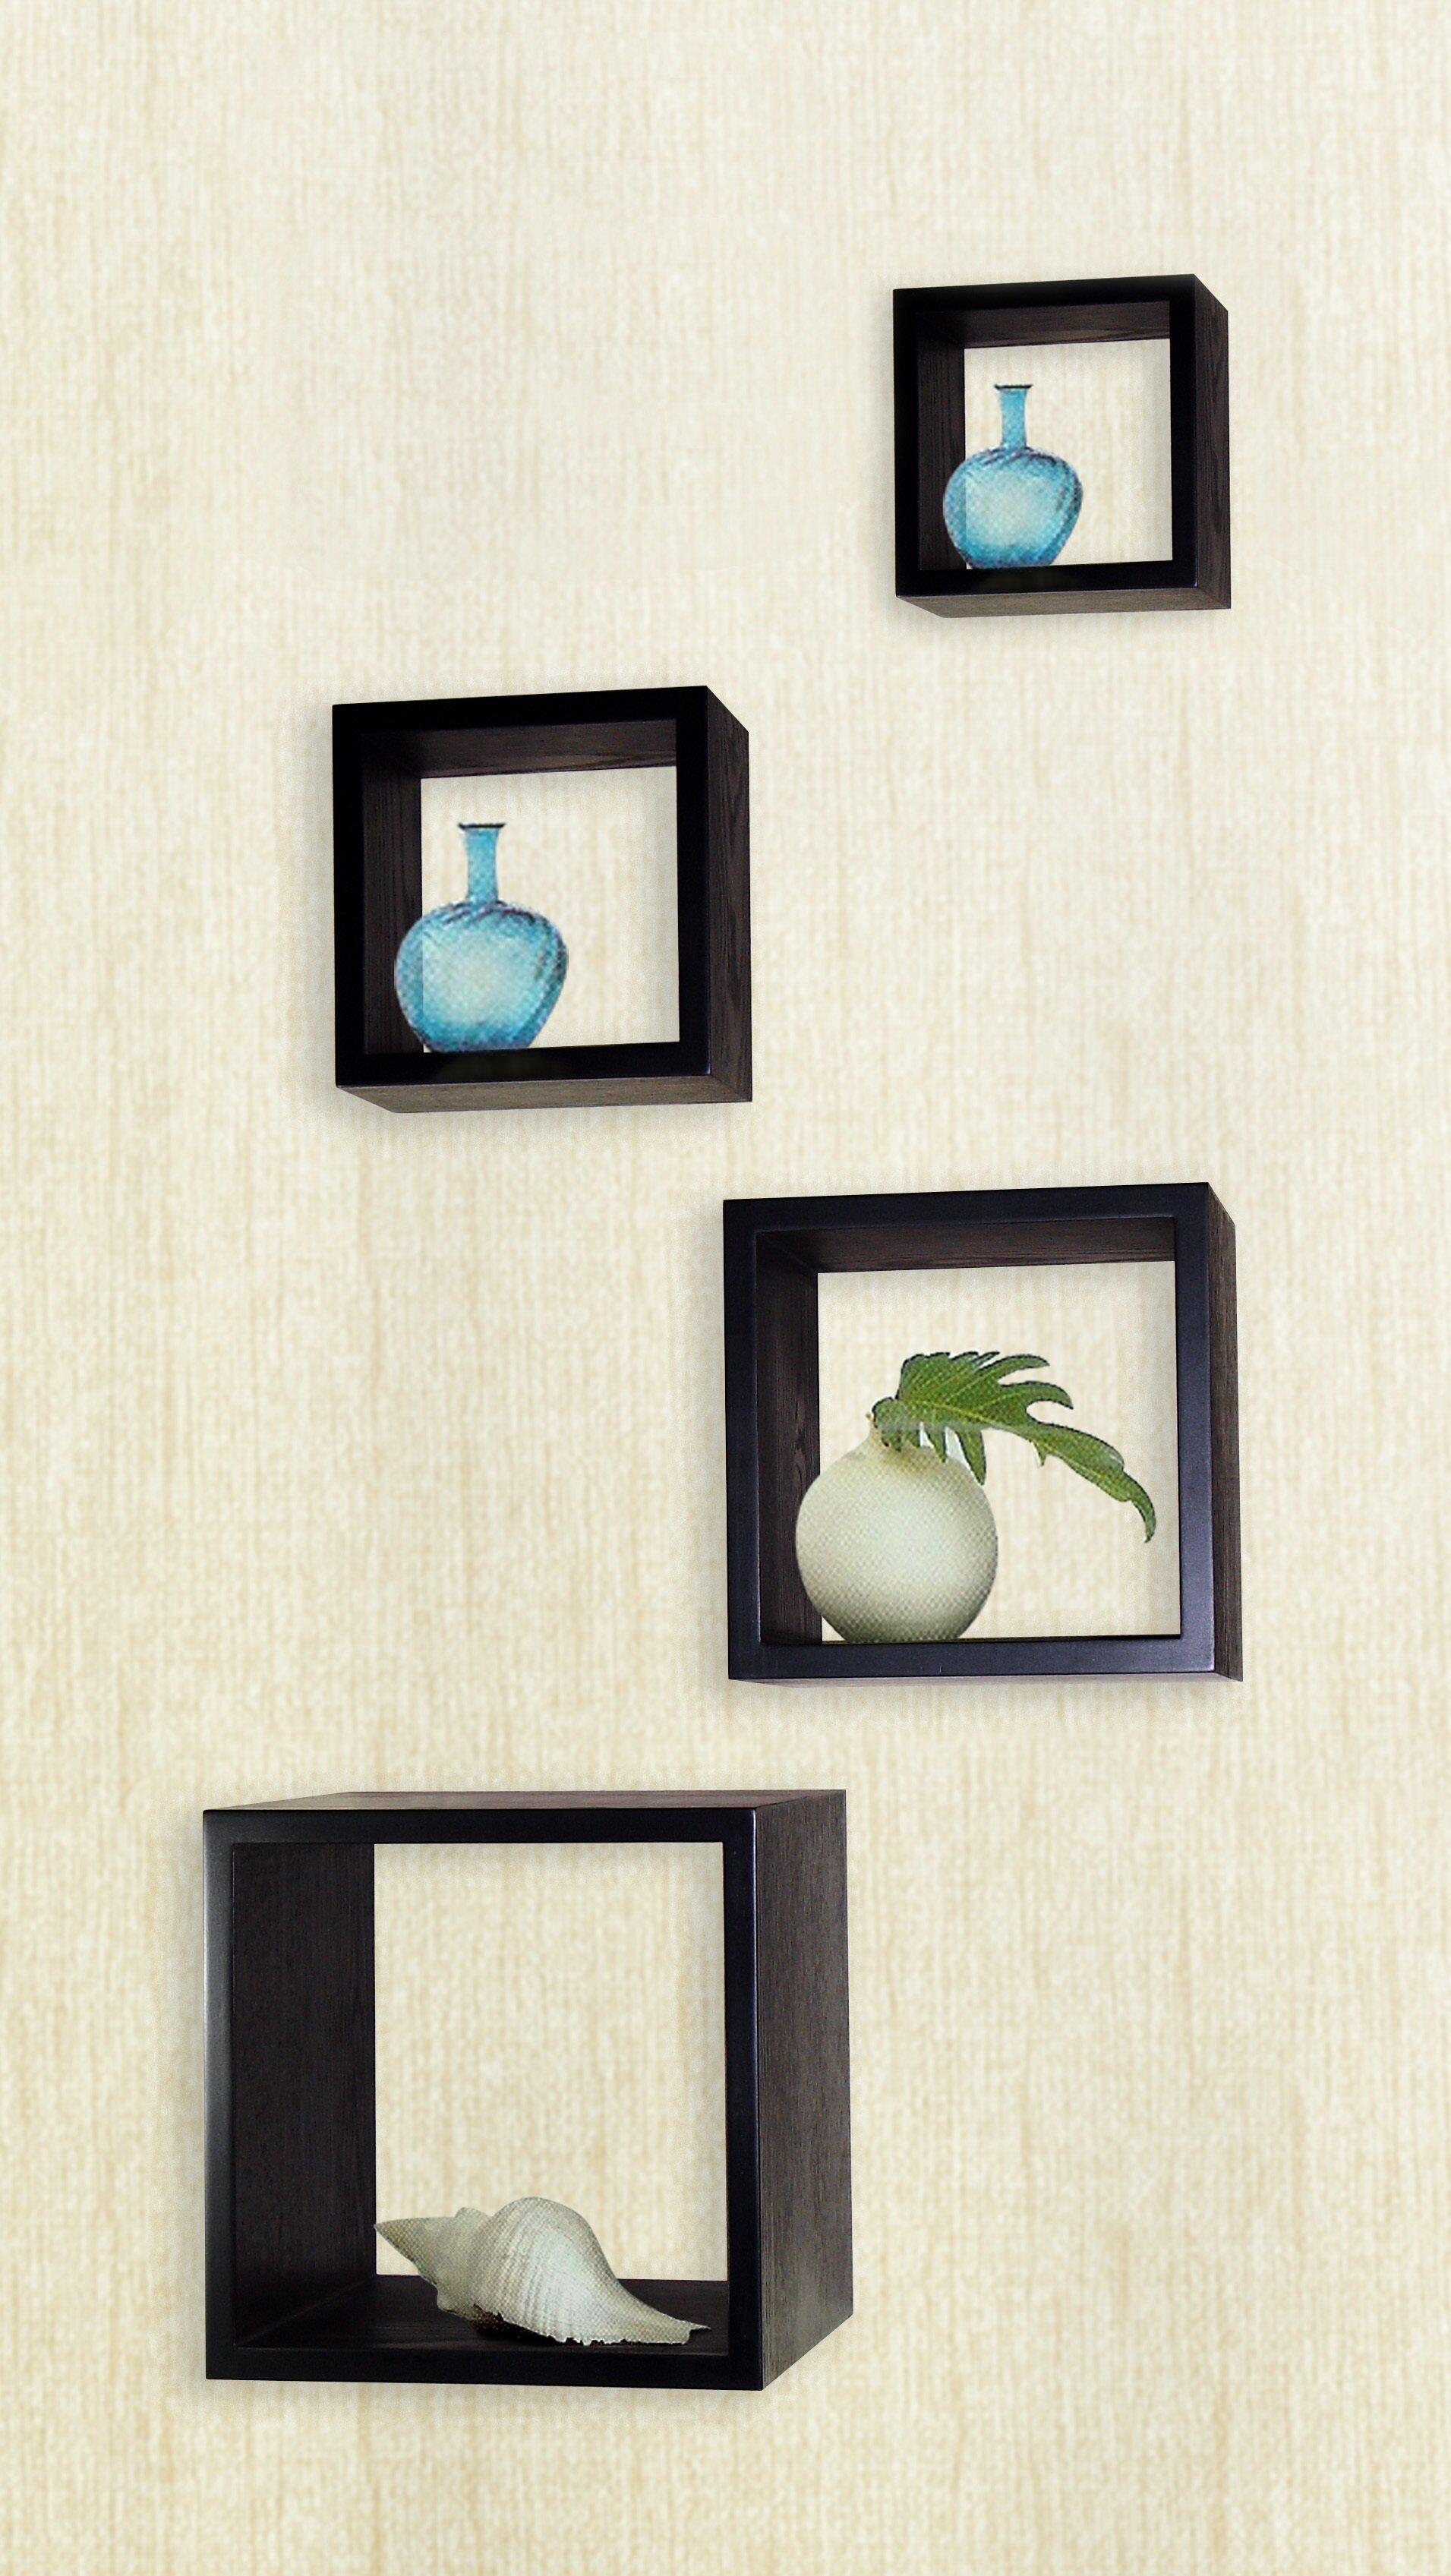 ebern designs flanigan 4 piece cube wall d cor set wayfair rh wayfair com